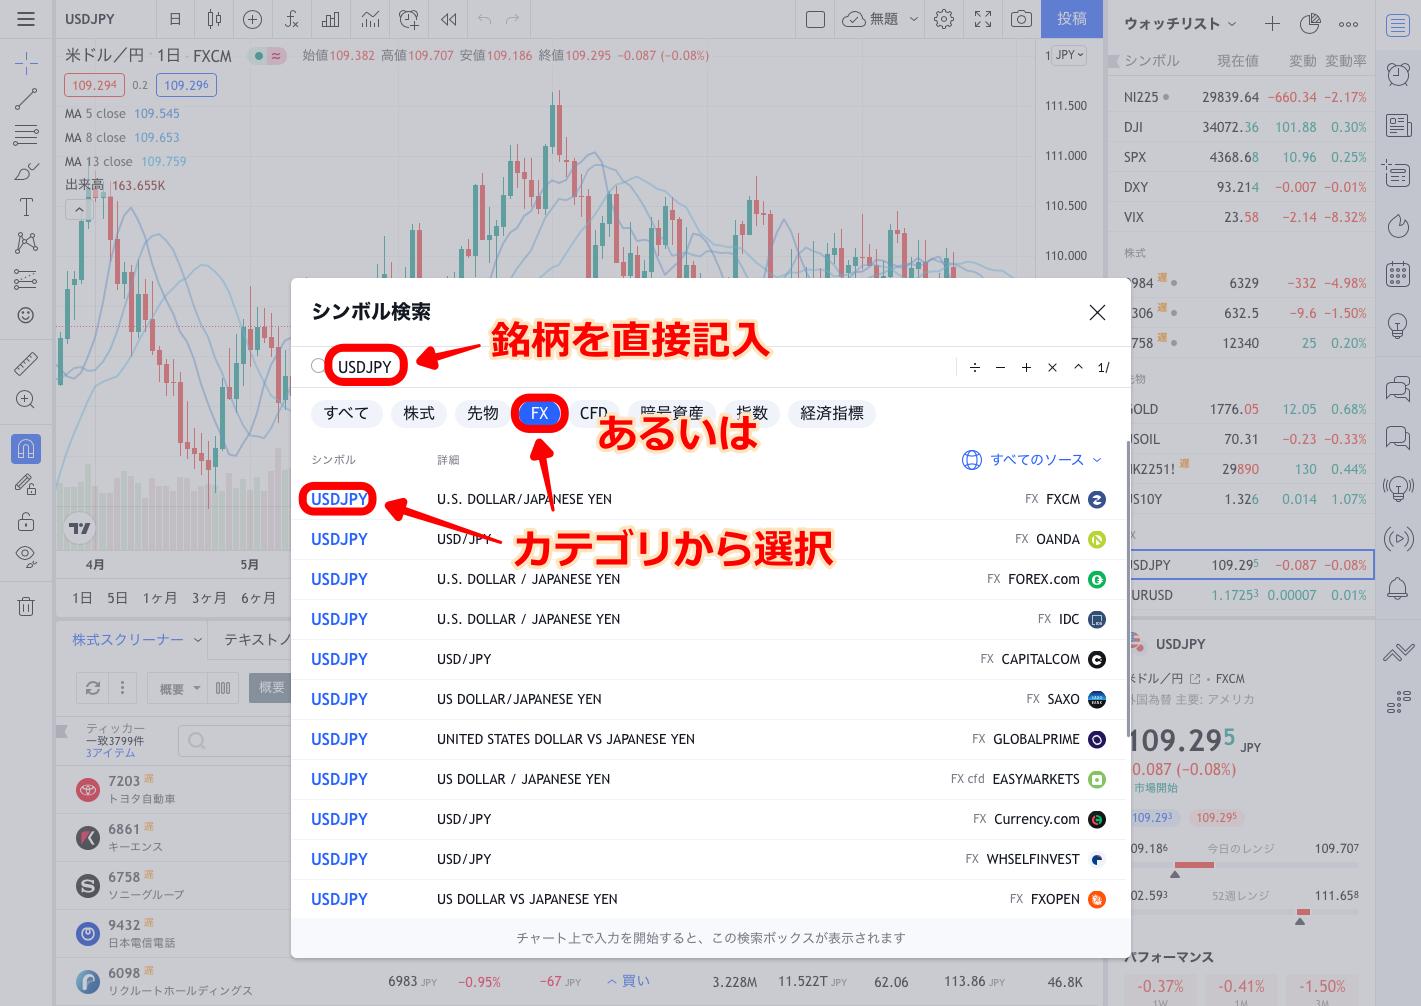 TradingView シンボル検索